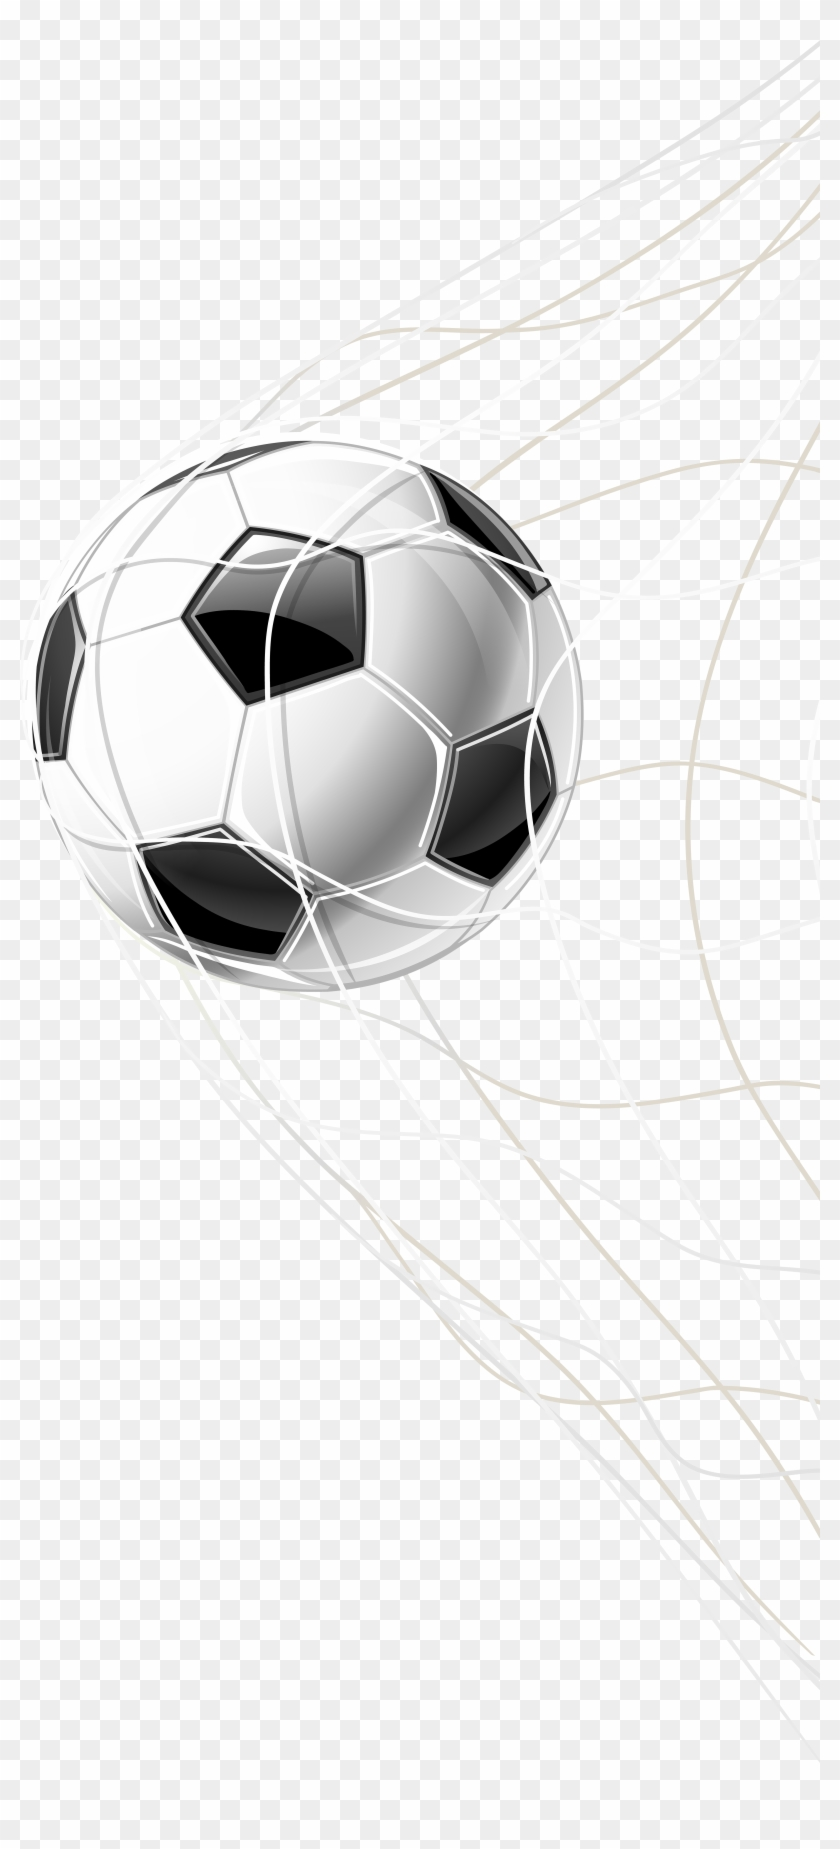 Soccer Goal In A Net Png Clip Art Image.